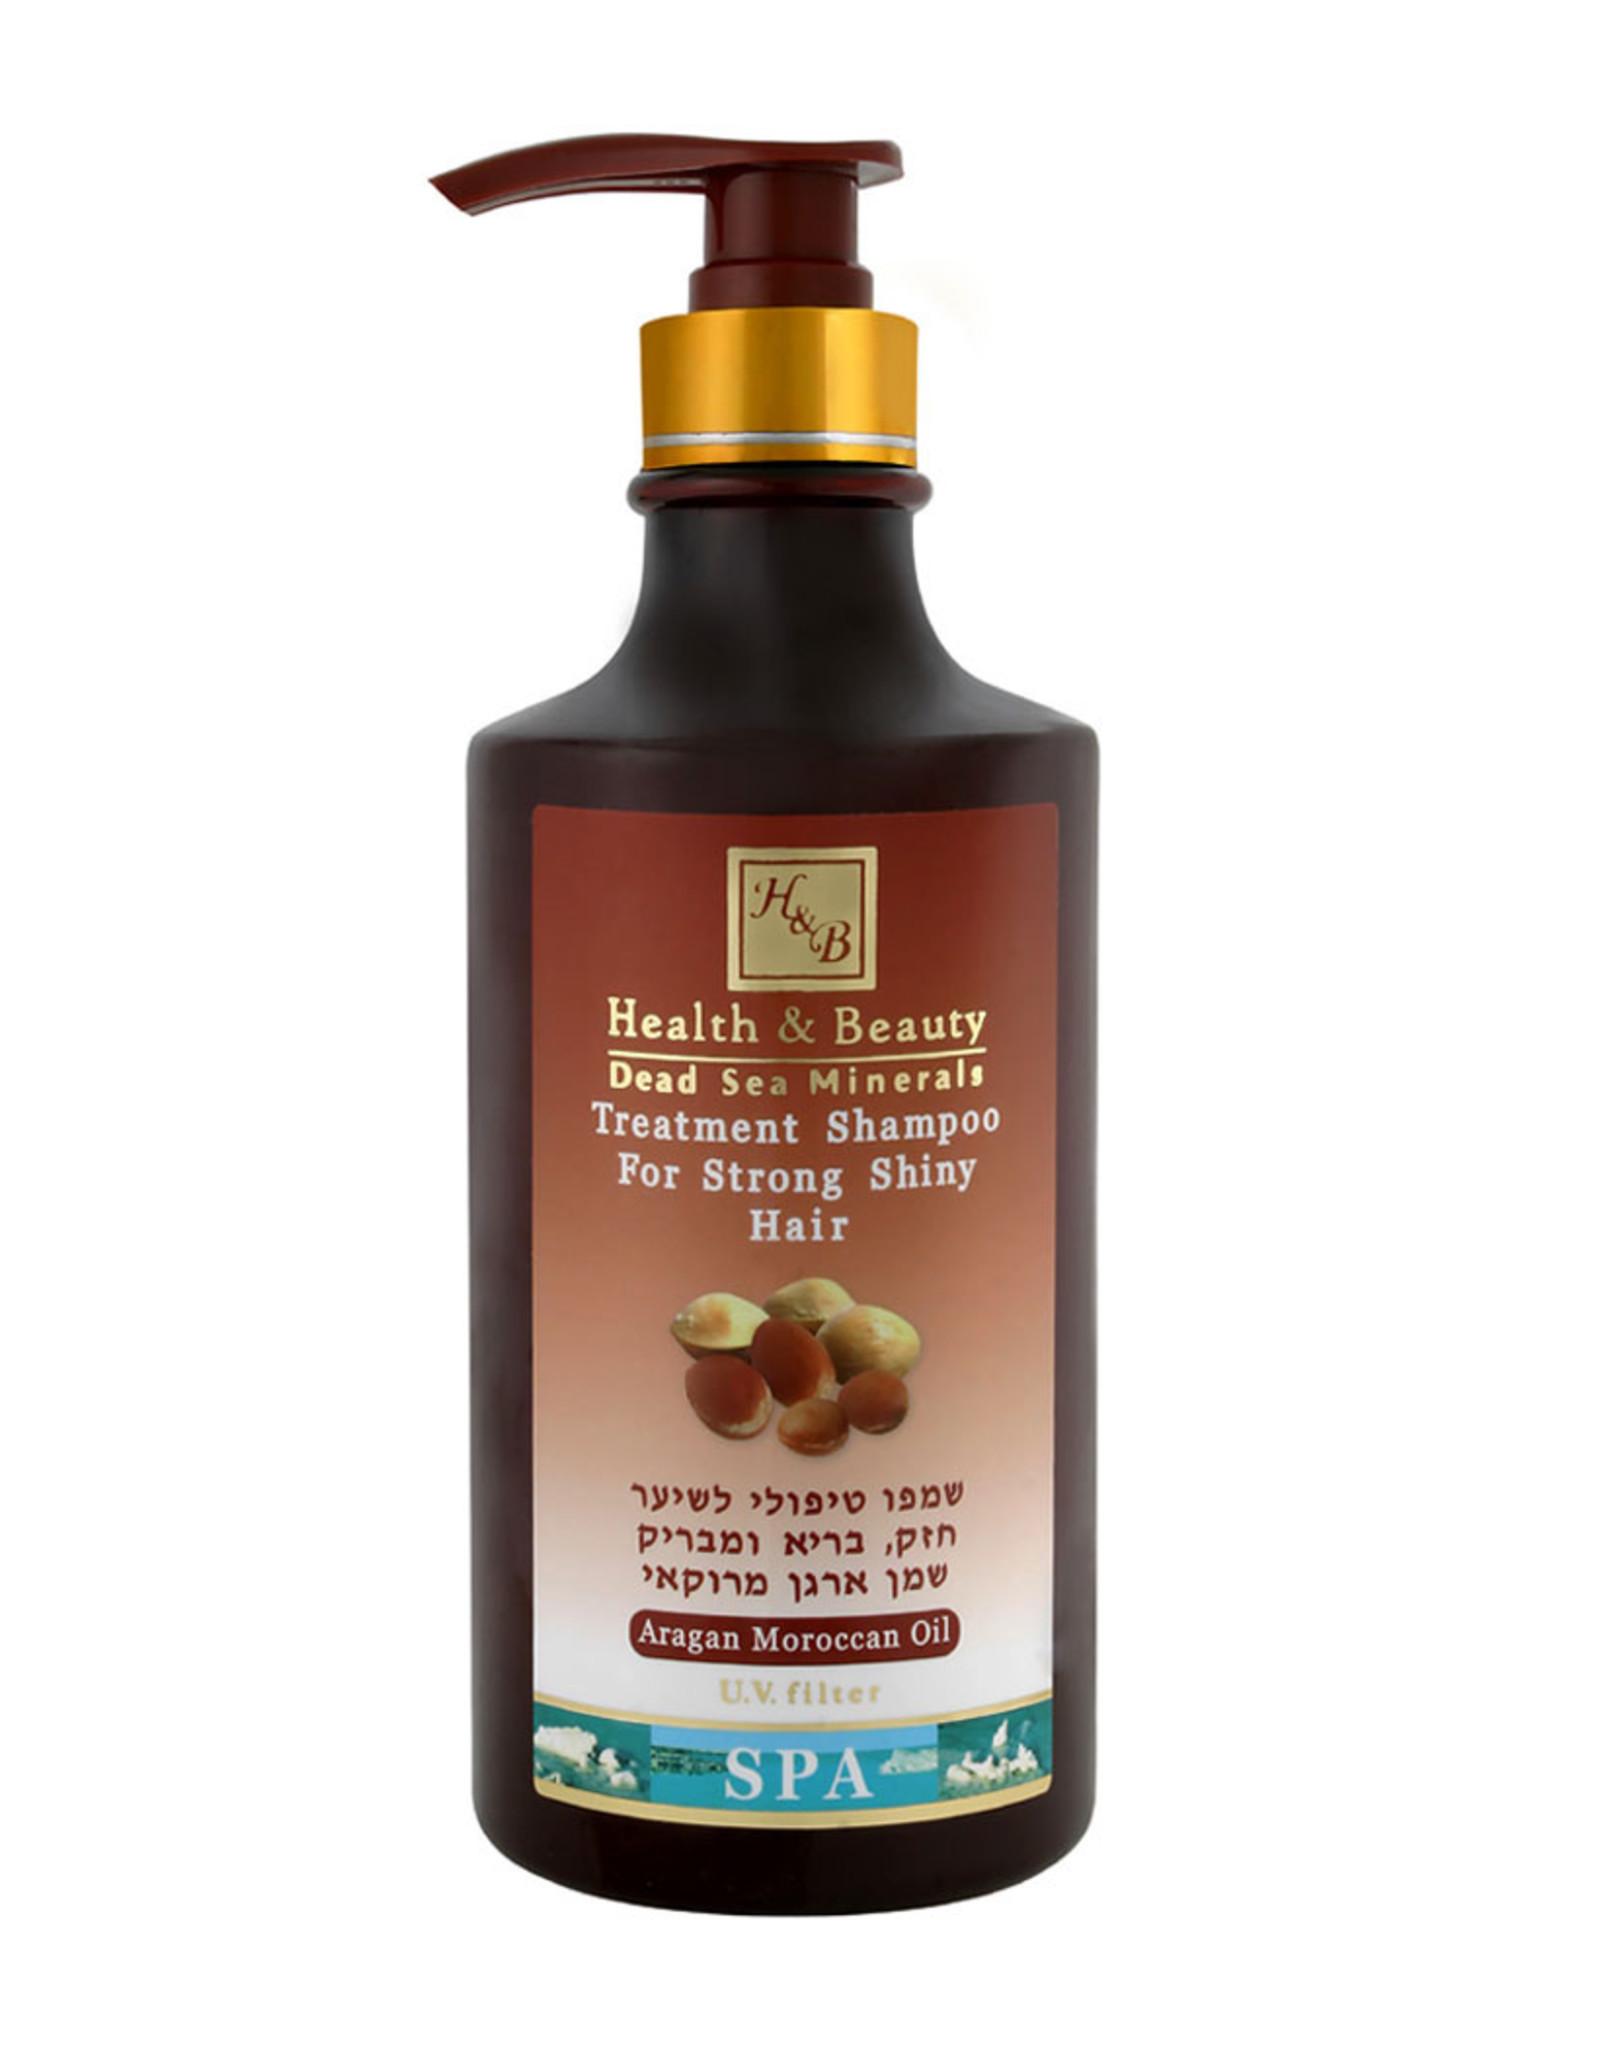 H&B Dead Sea Minerals Arganolie shampoo; 780 ml.